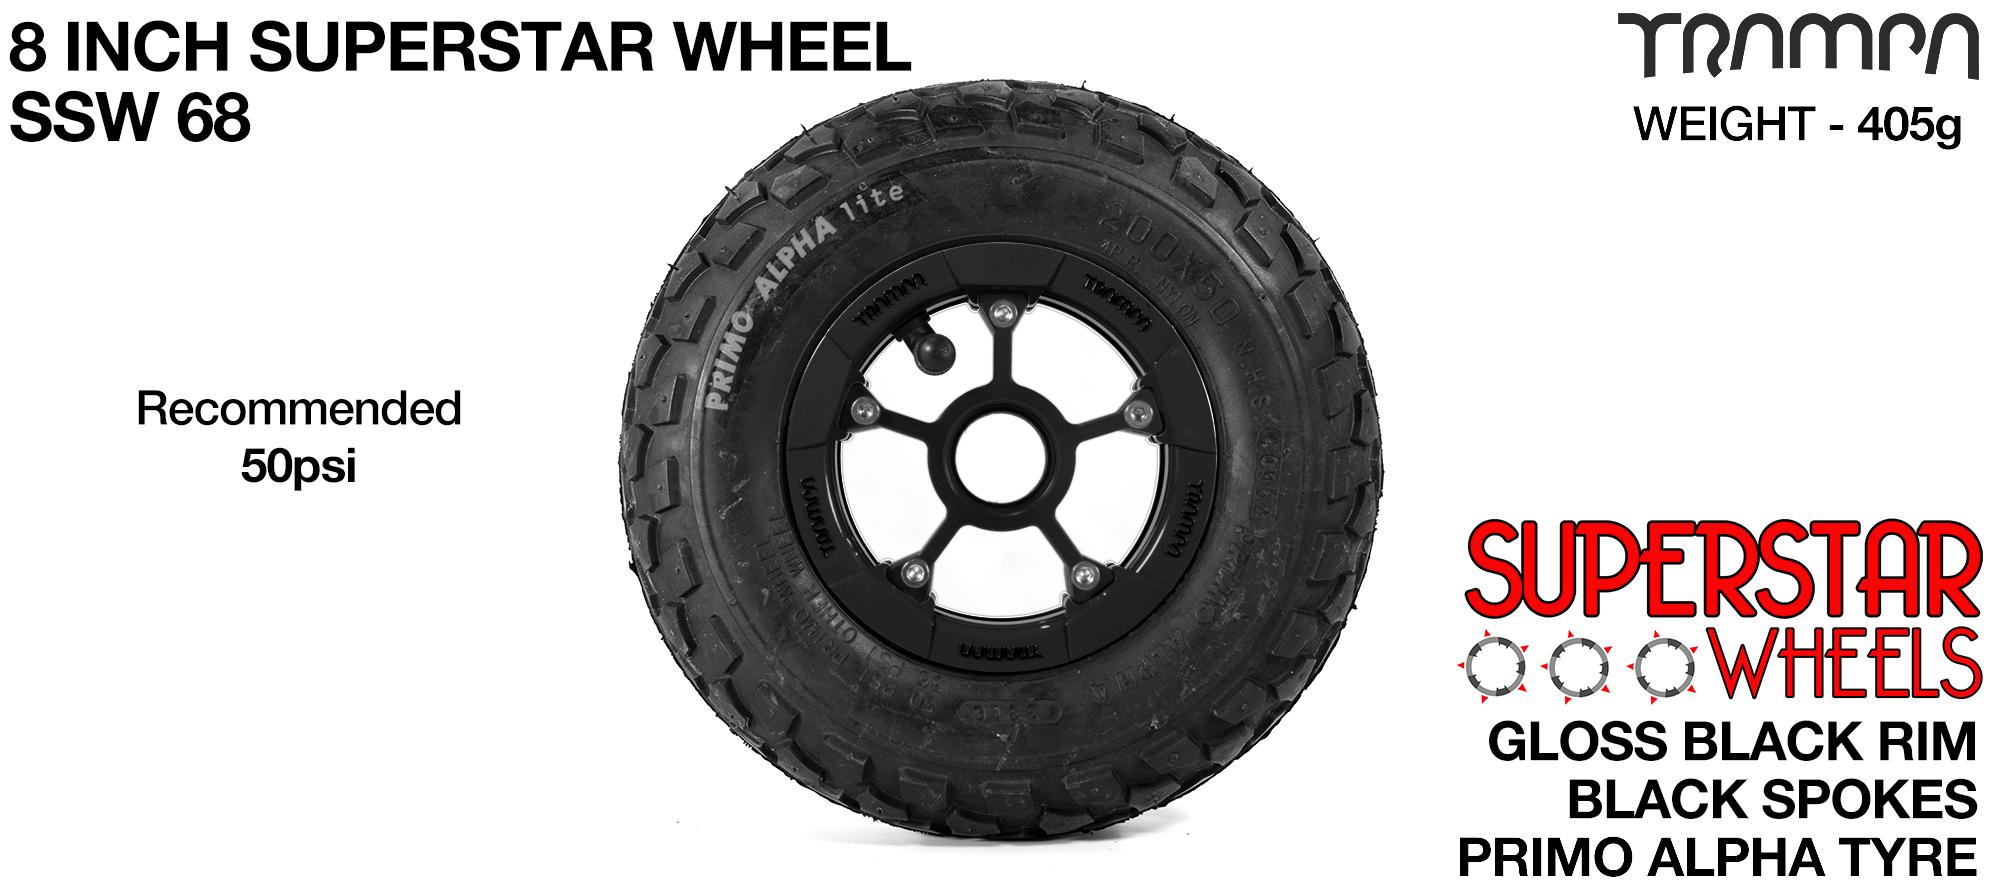 Superstar 8 inch wheel - Black Gloss Rim with Black Anodised spokes & Black Alpha 8 Inch Tyres